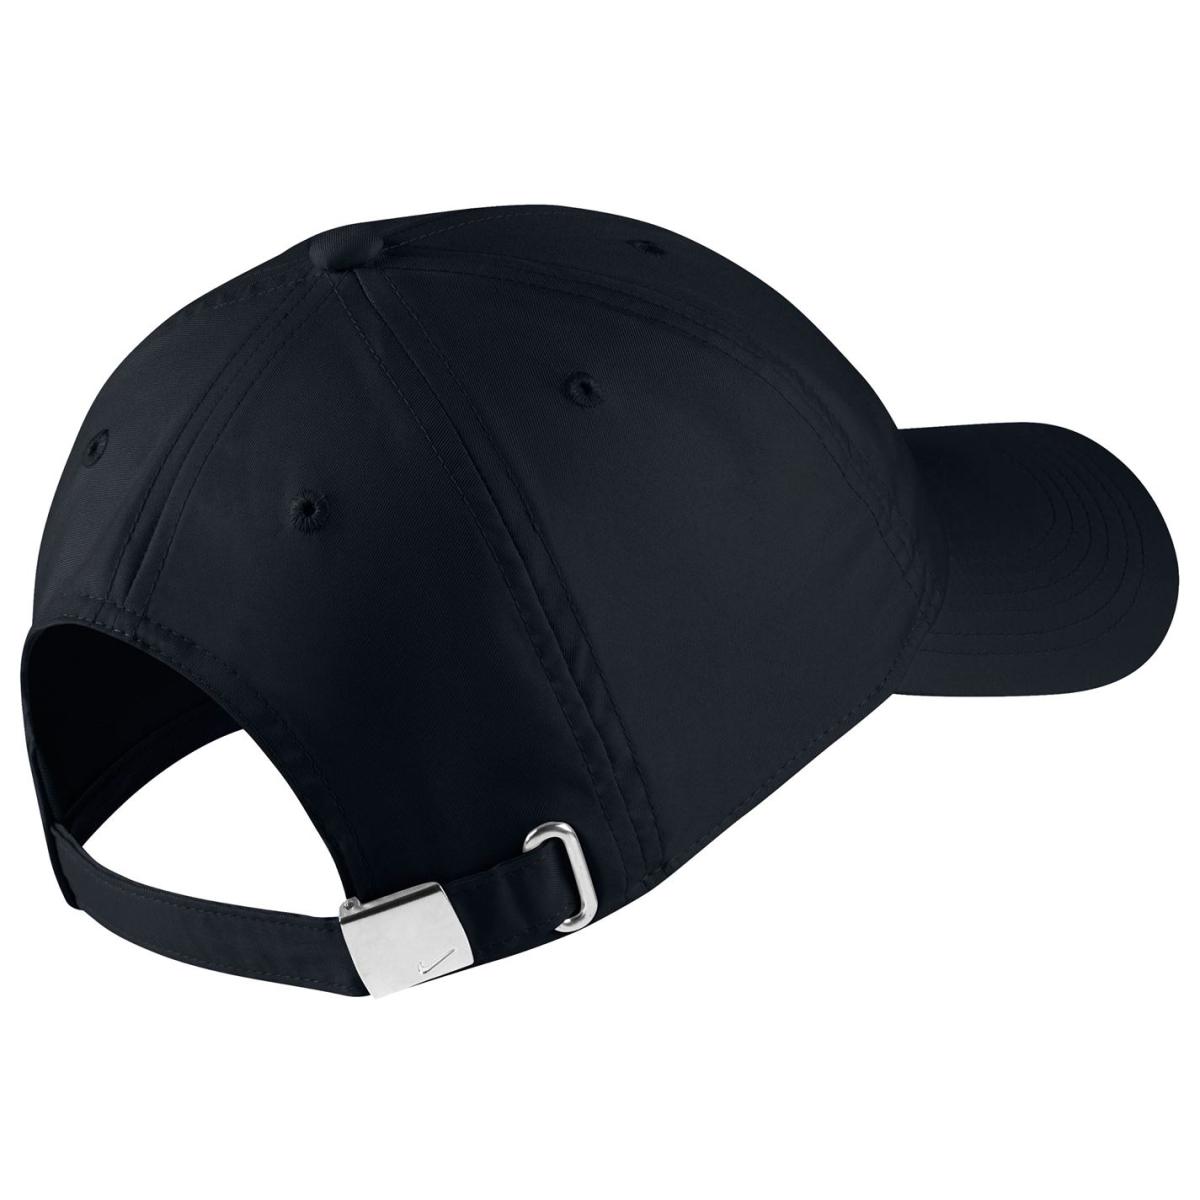 Nike Cap Mädchen